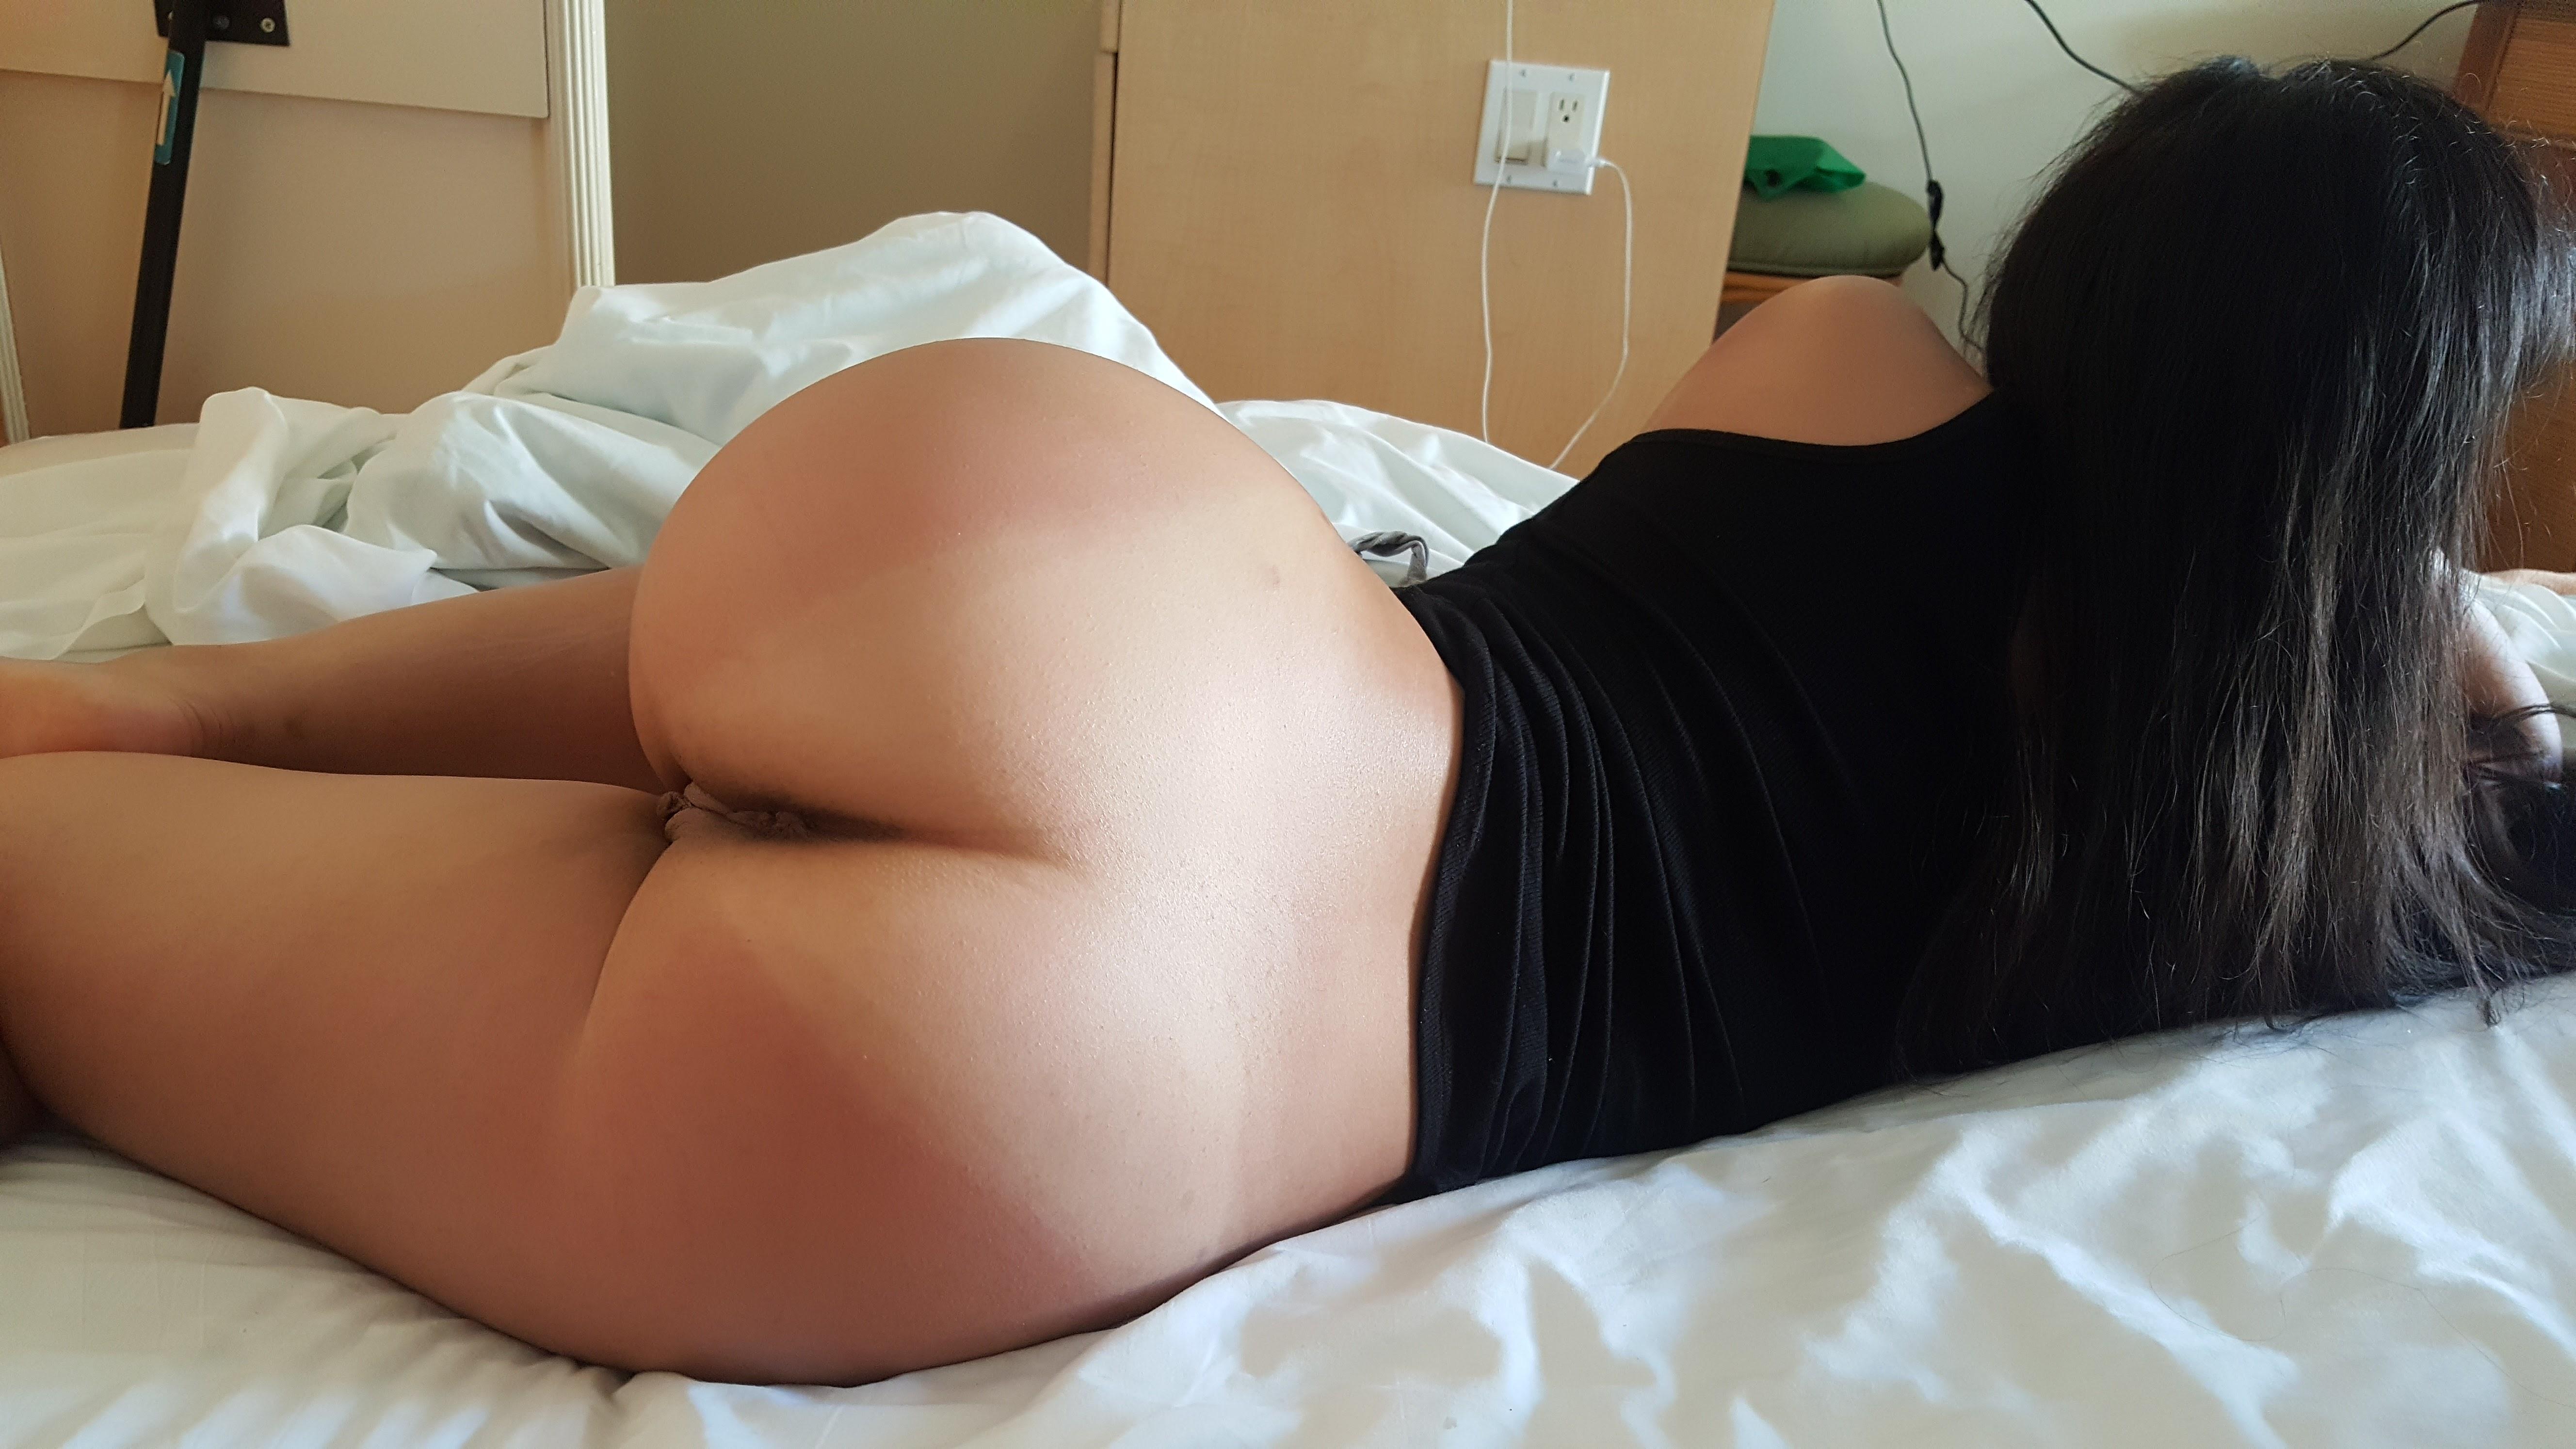 Teasing Latina Naked In Shower Gutteruncensored Scandal Photo Photo Leaked